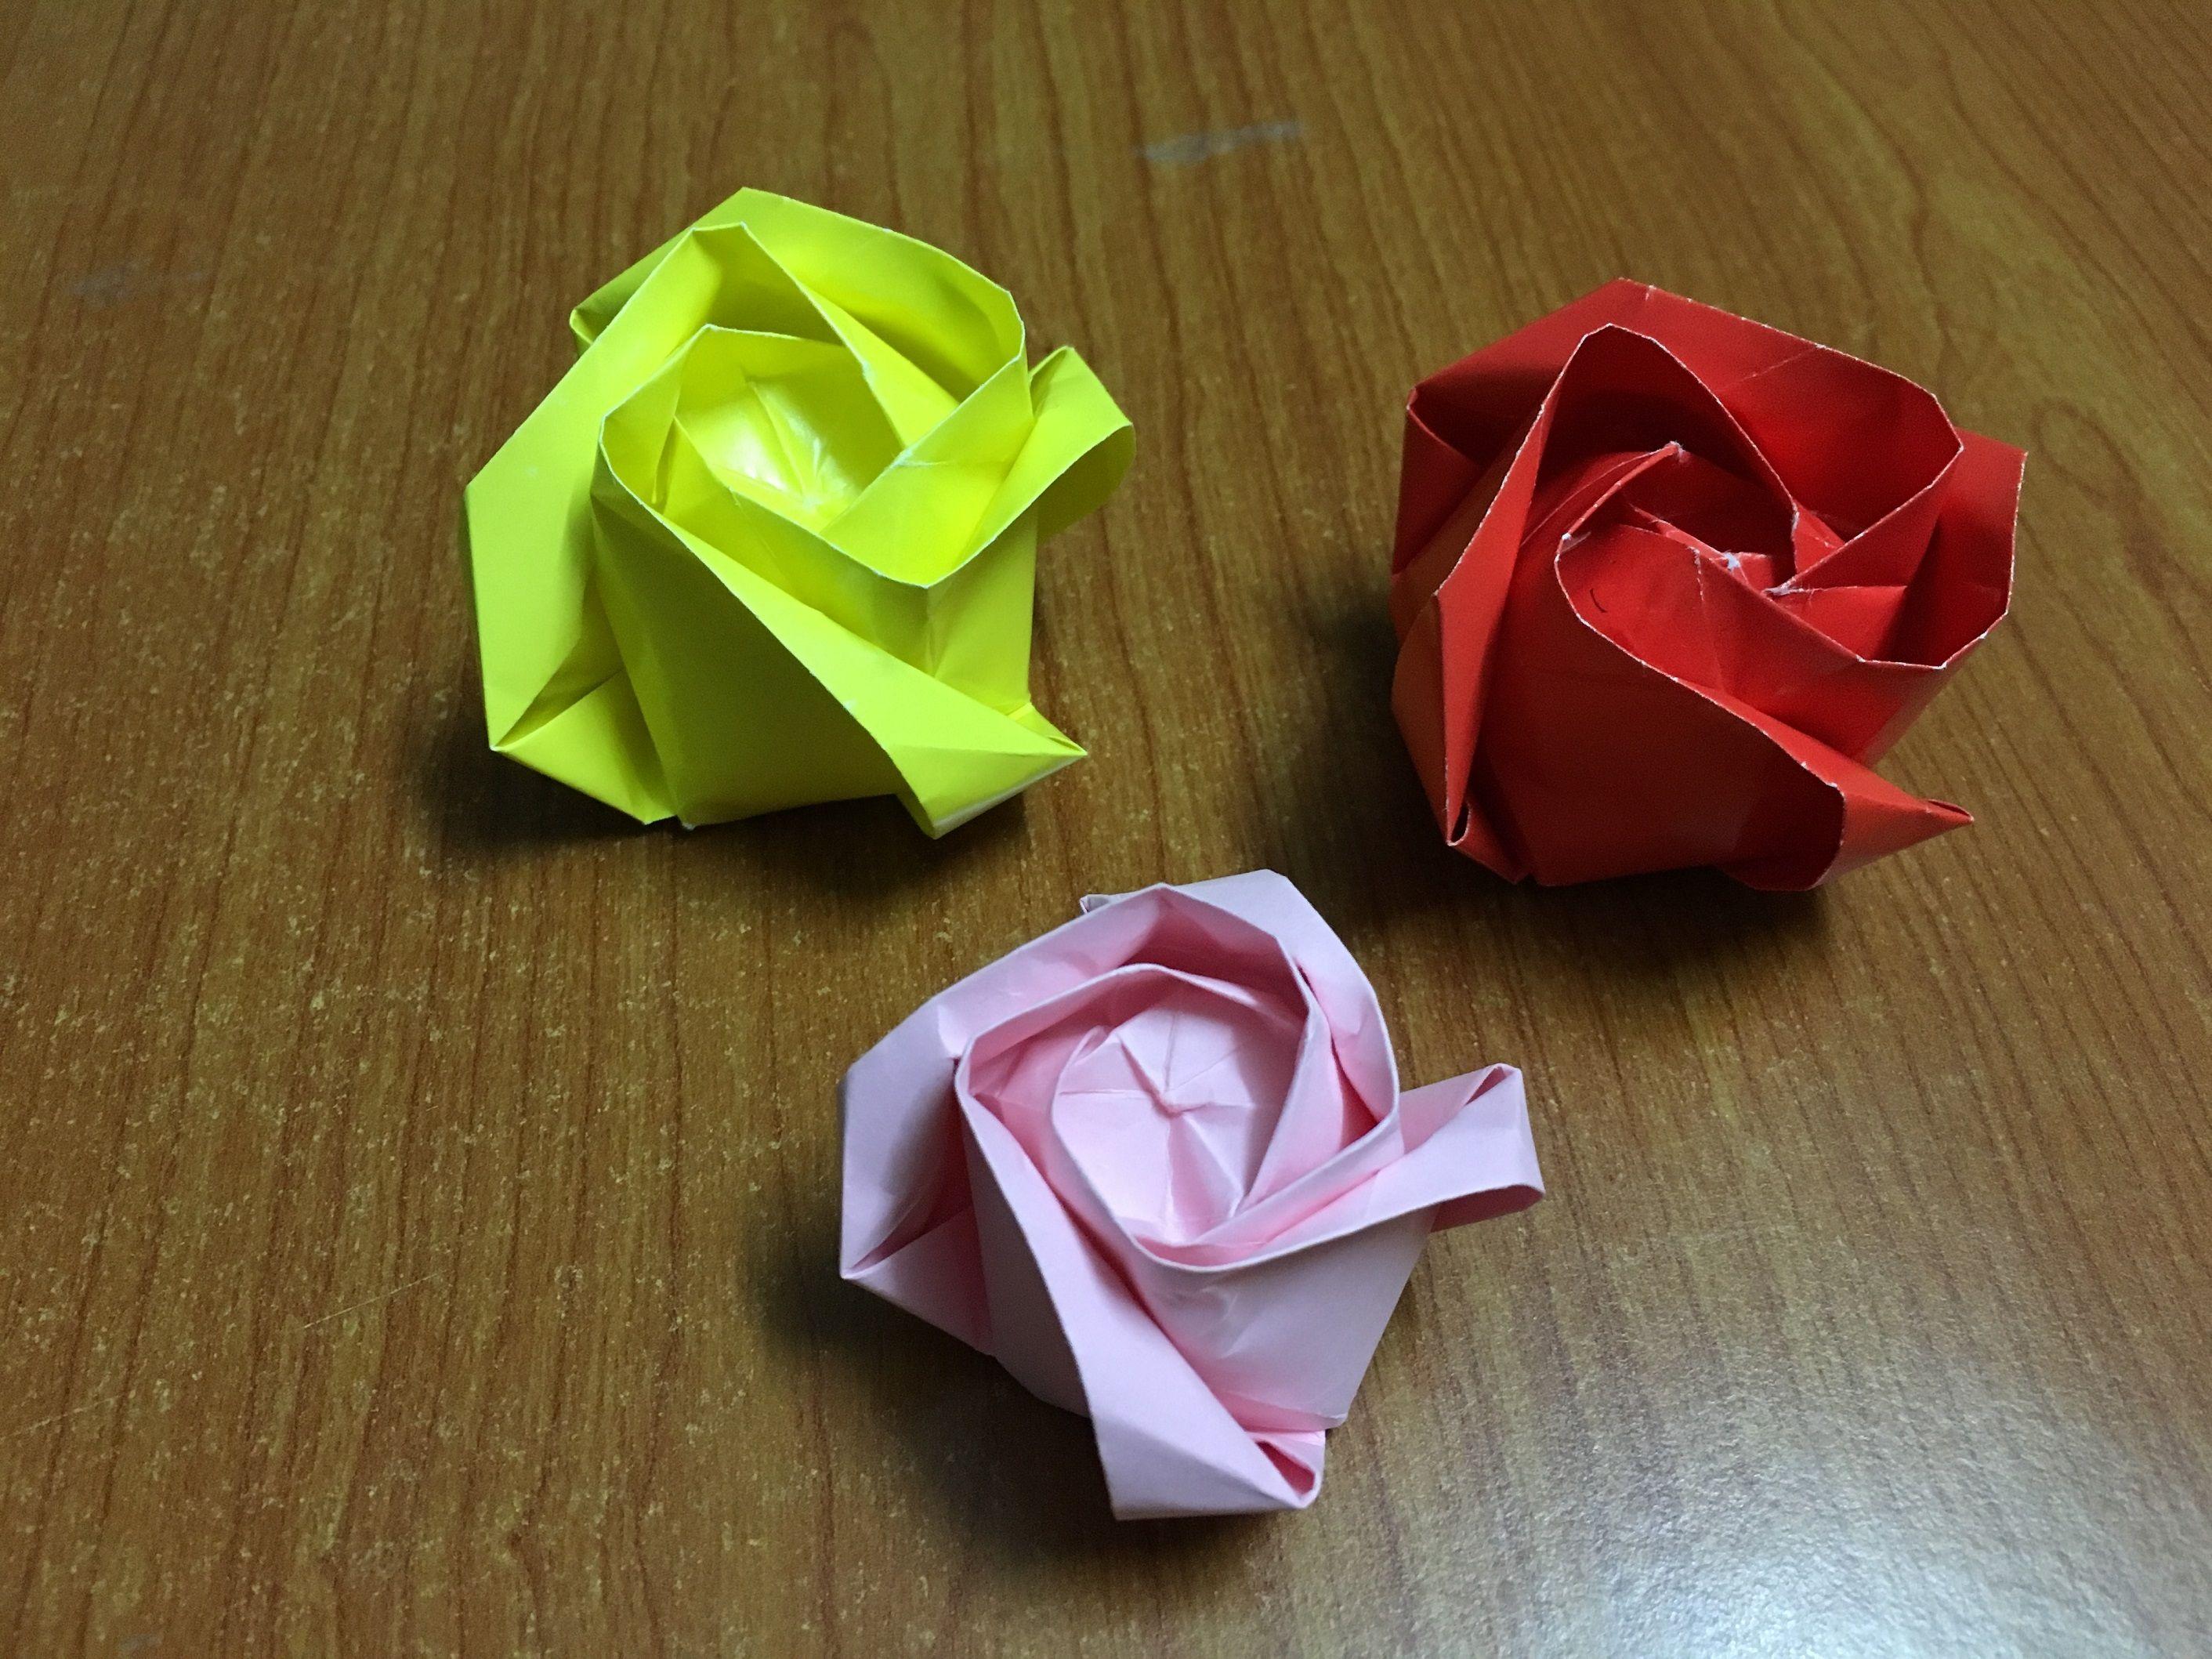 How To Make Origami Flower Rose Of Roses Diy Tutorial Origami